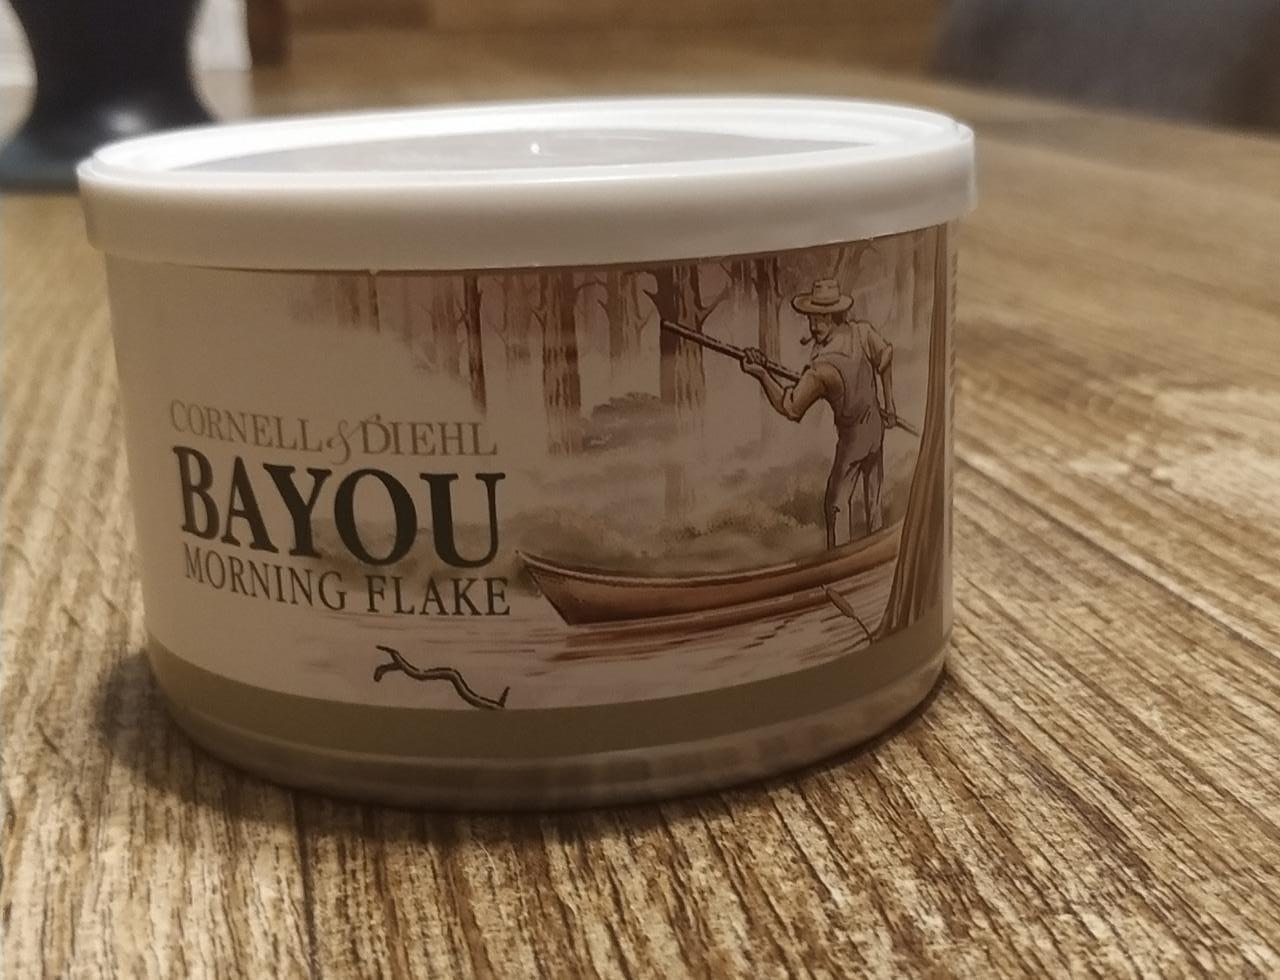 Cornell & Diehl - Bayou Morning Flake